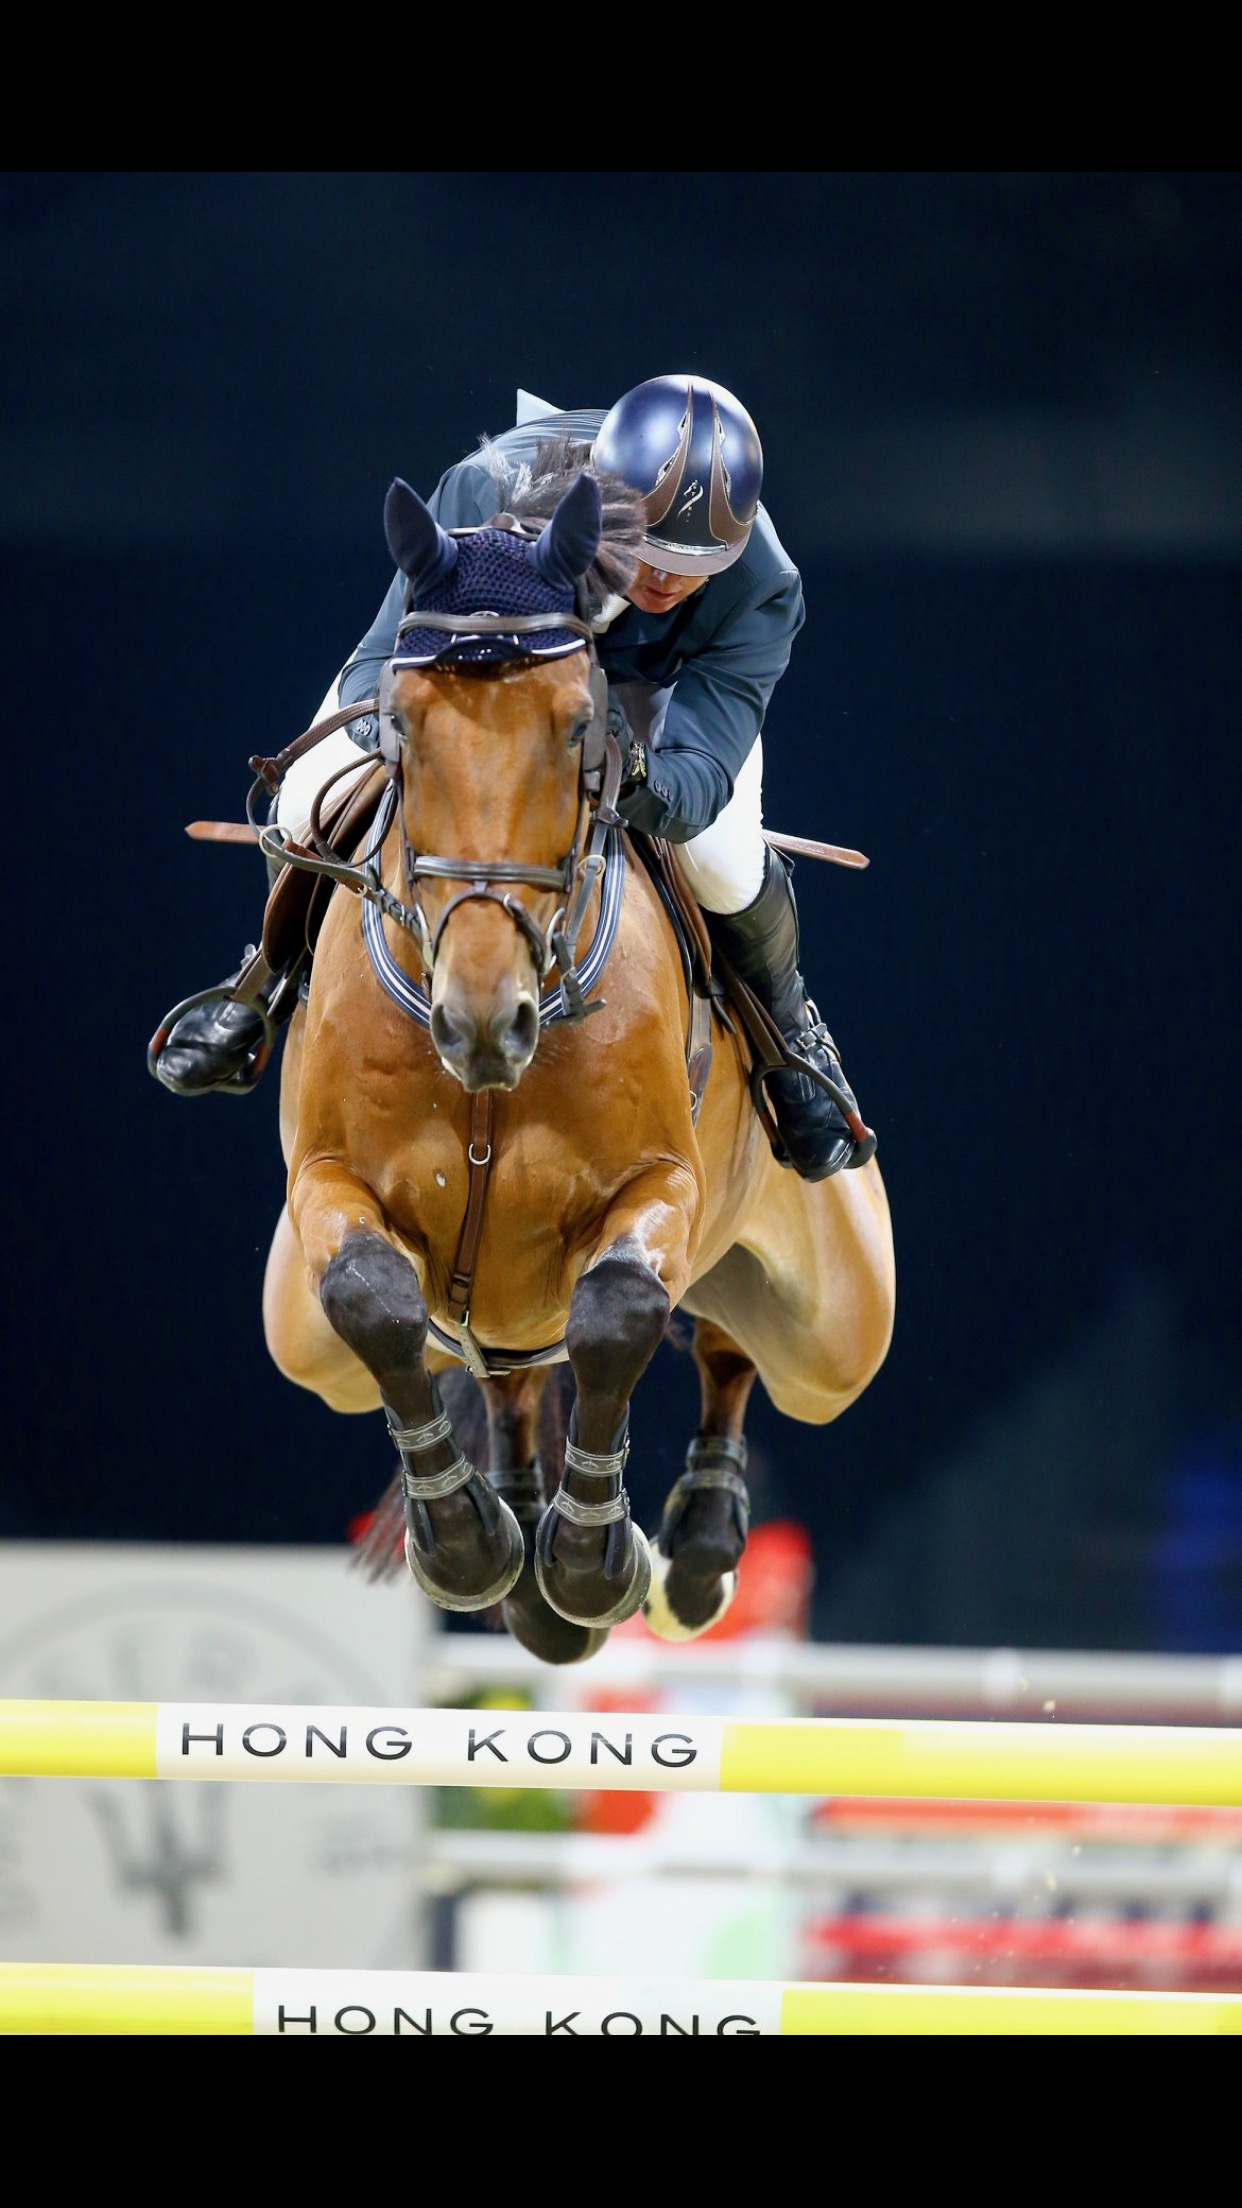 Jamie Kermond - 3x Australian Representative at World Equestrian Games, Aachen & Normandie & Tryon3x Australian Champion 2013, 2016 & 2017Represented Australia World Cup Final 2013 Lyon & 2018 Paris